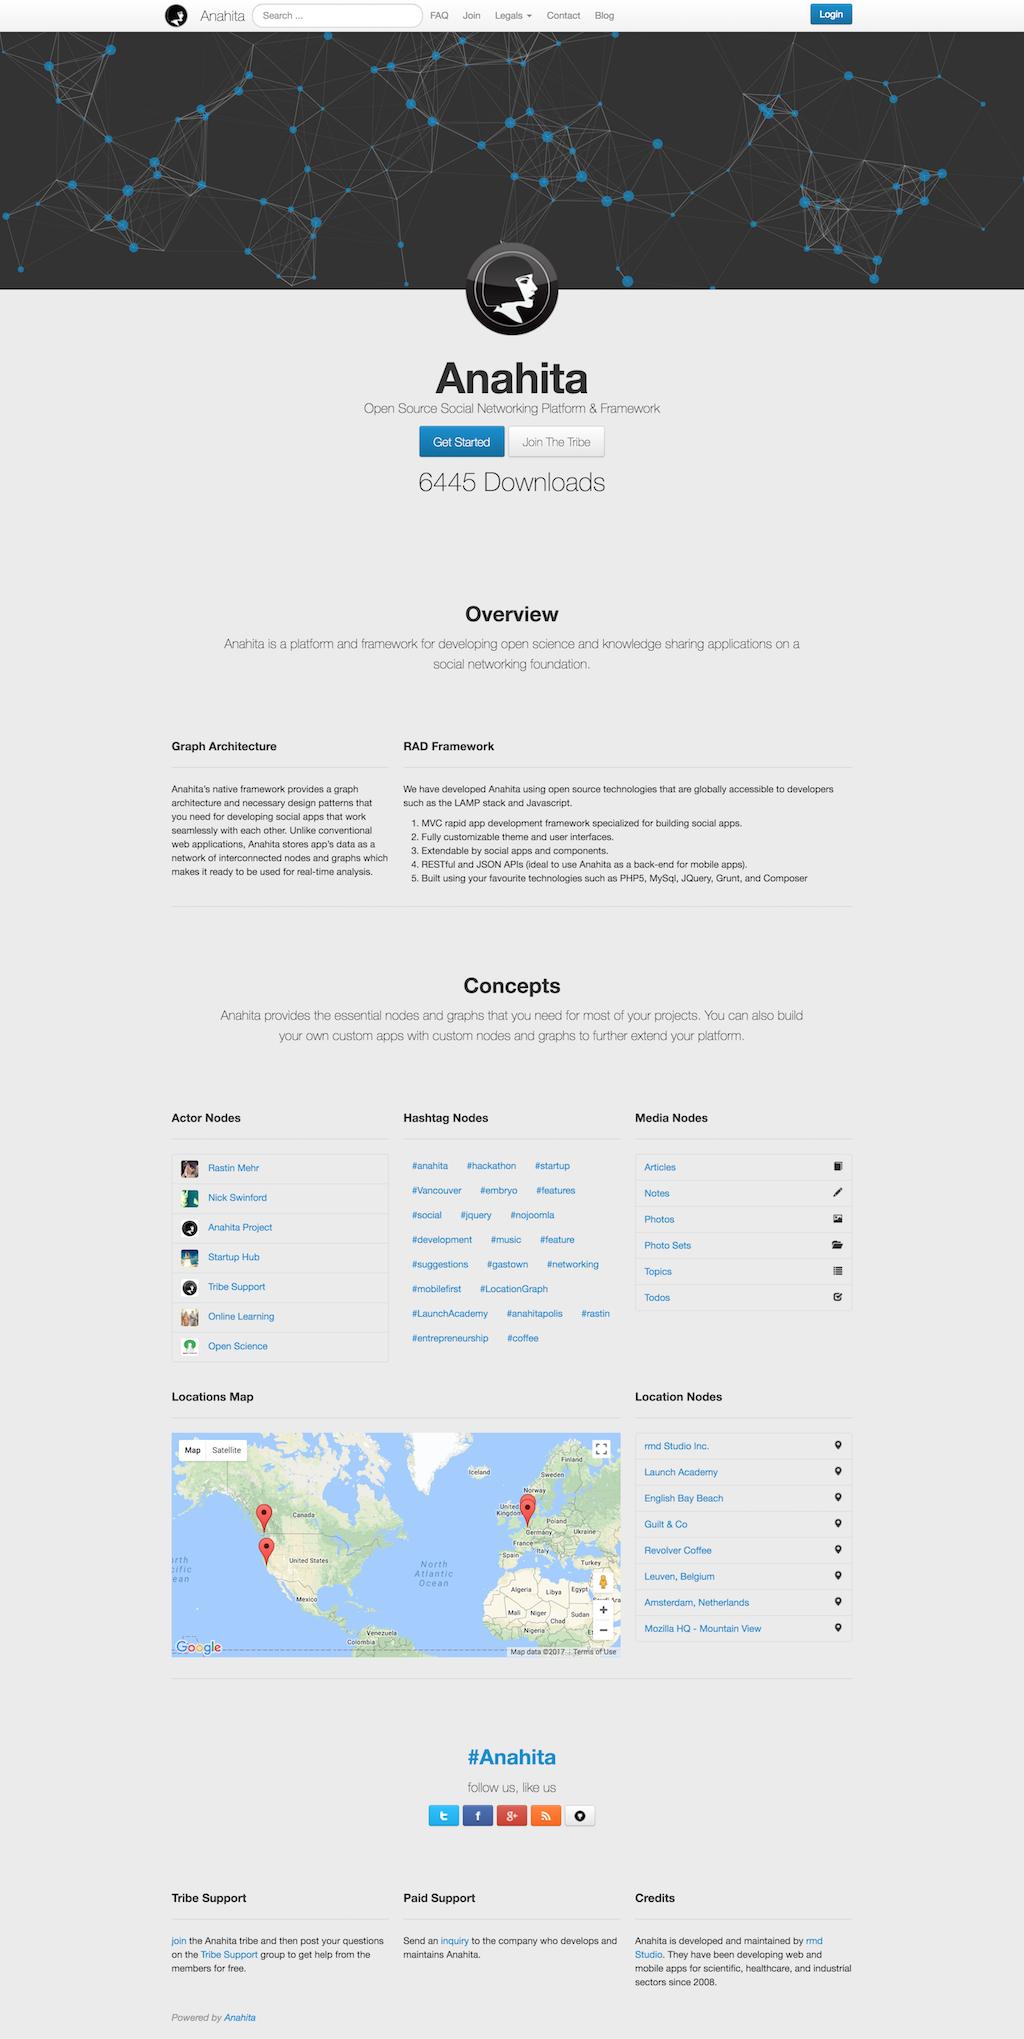 Anahita Social Networking Platform & Framework